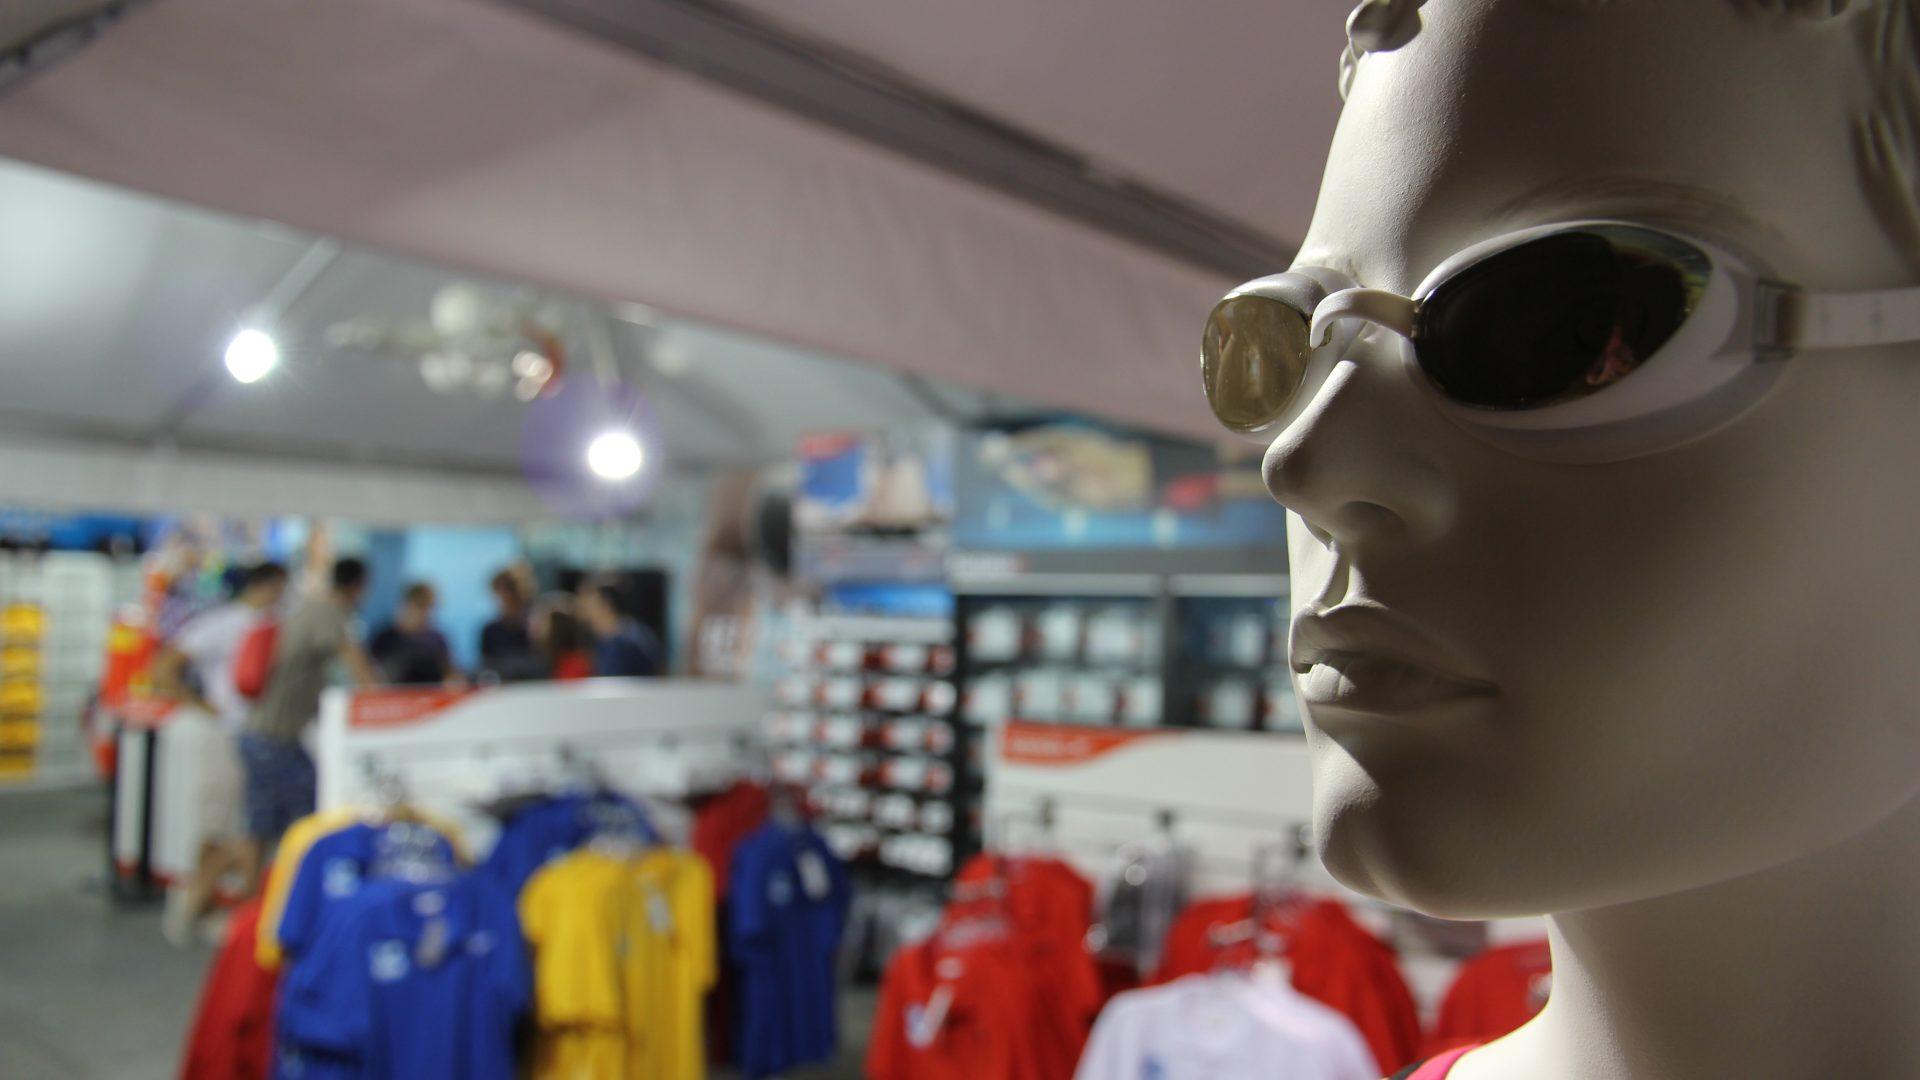 World Aquatics Championships in Barcelona - temporary store